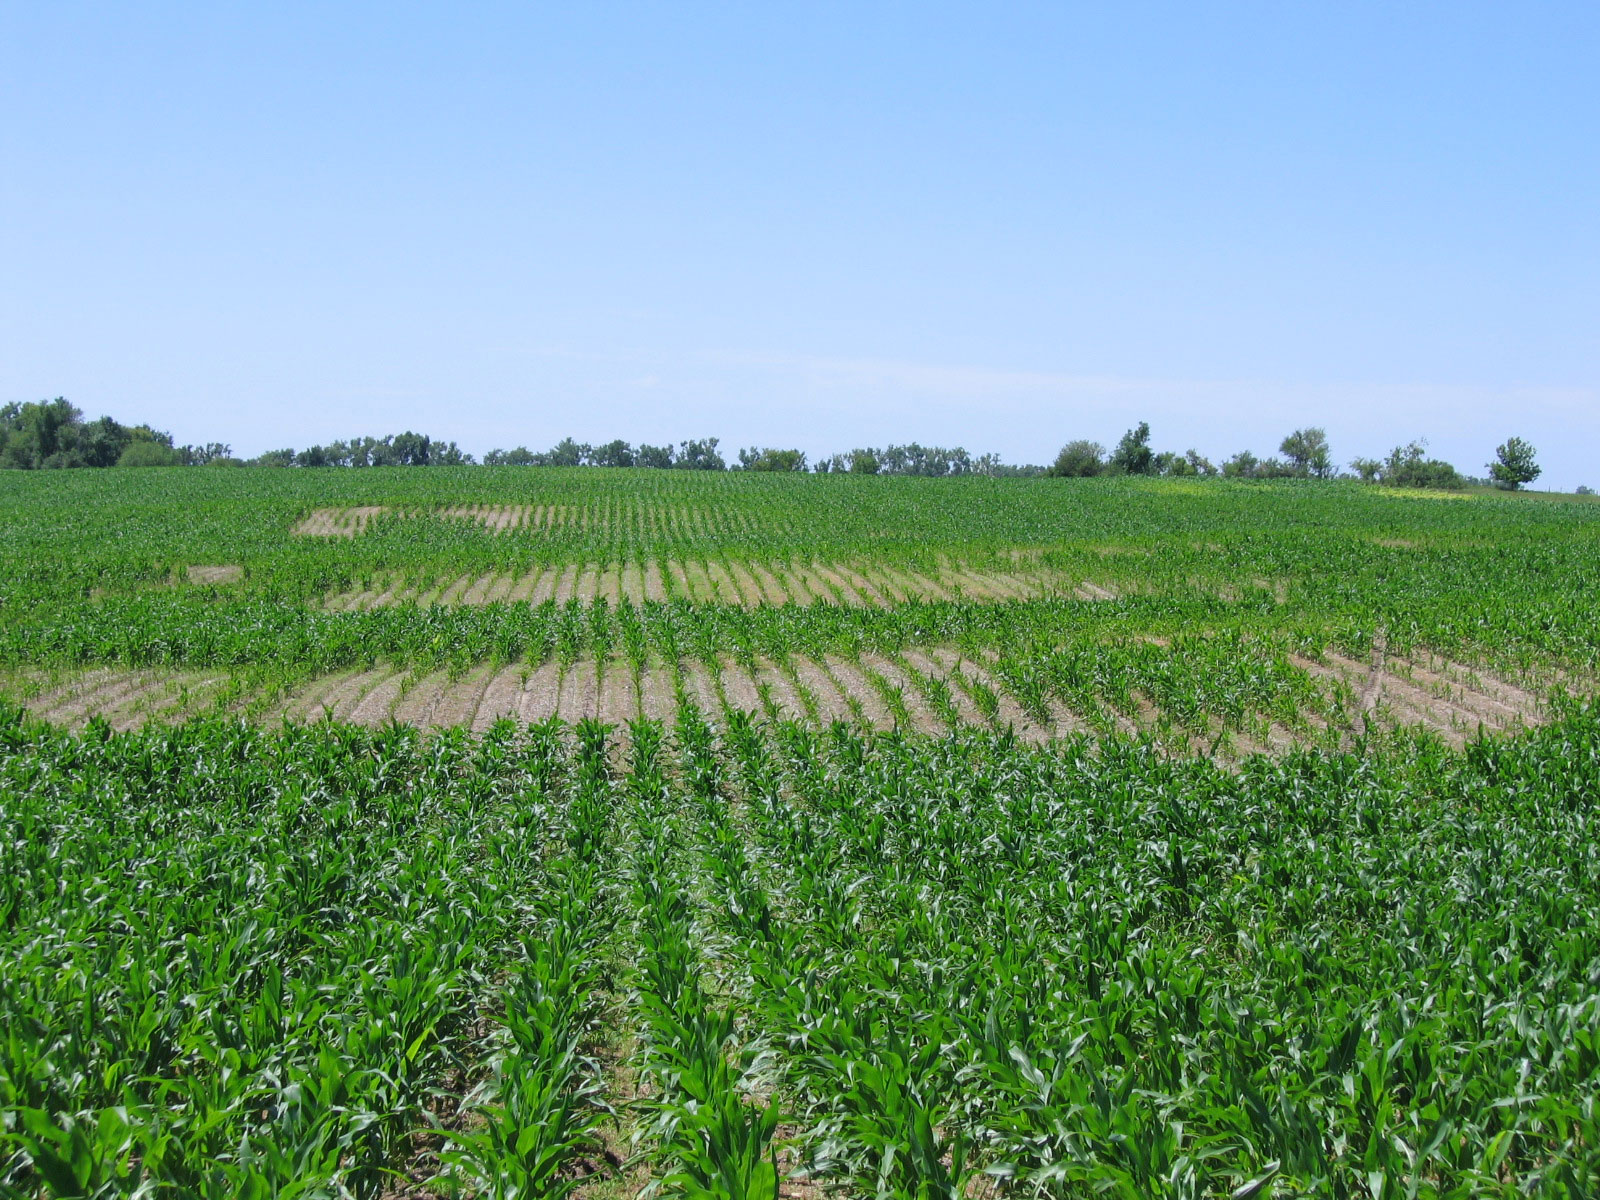 Severe nematode damage in corn